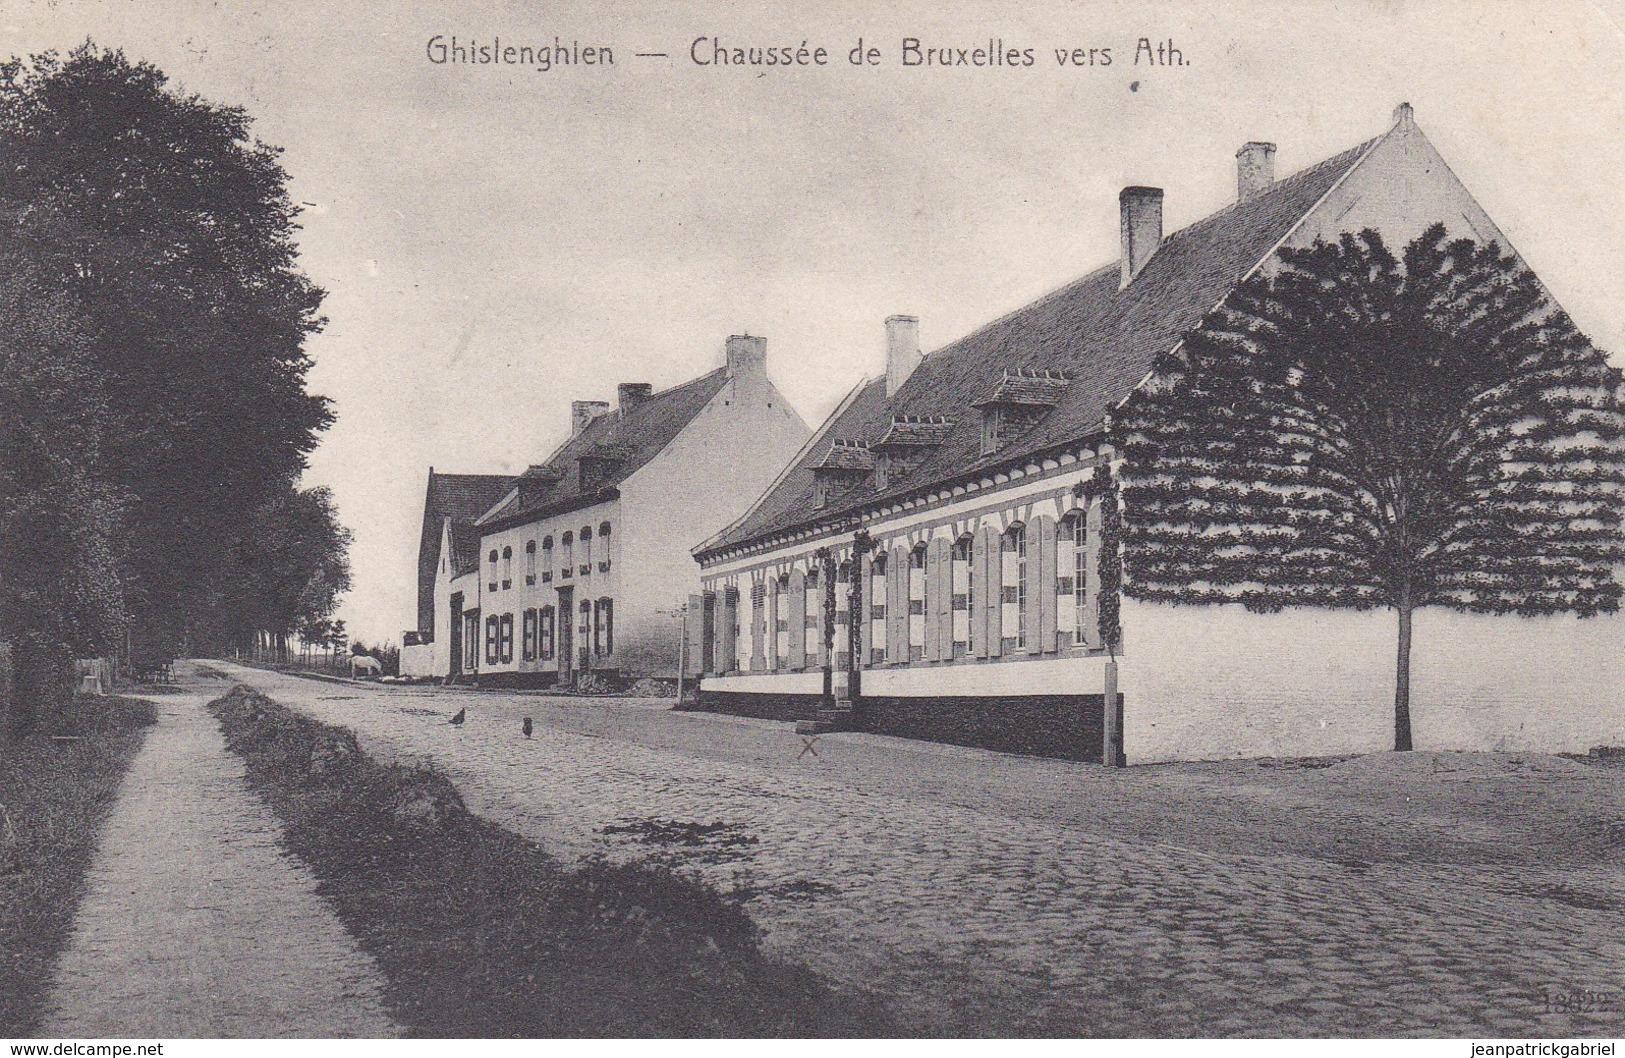 619 Ghislenghien Chaussee De Bruxelles Vers Ath - Belgien